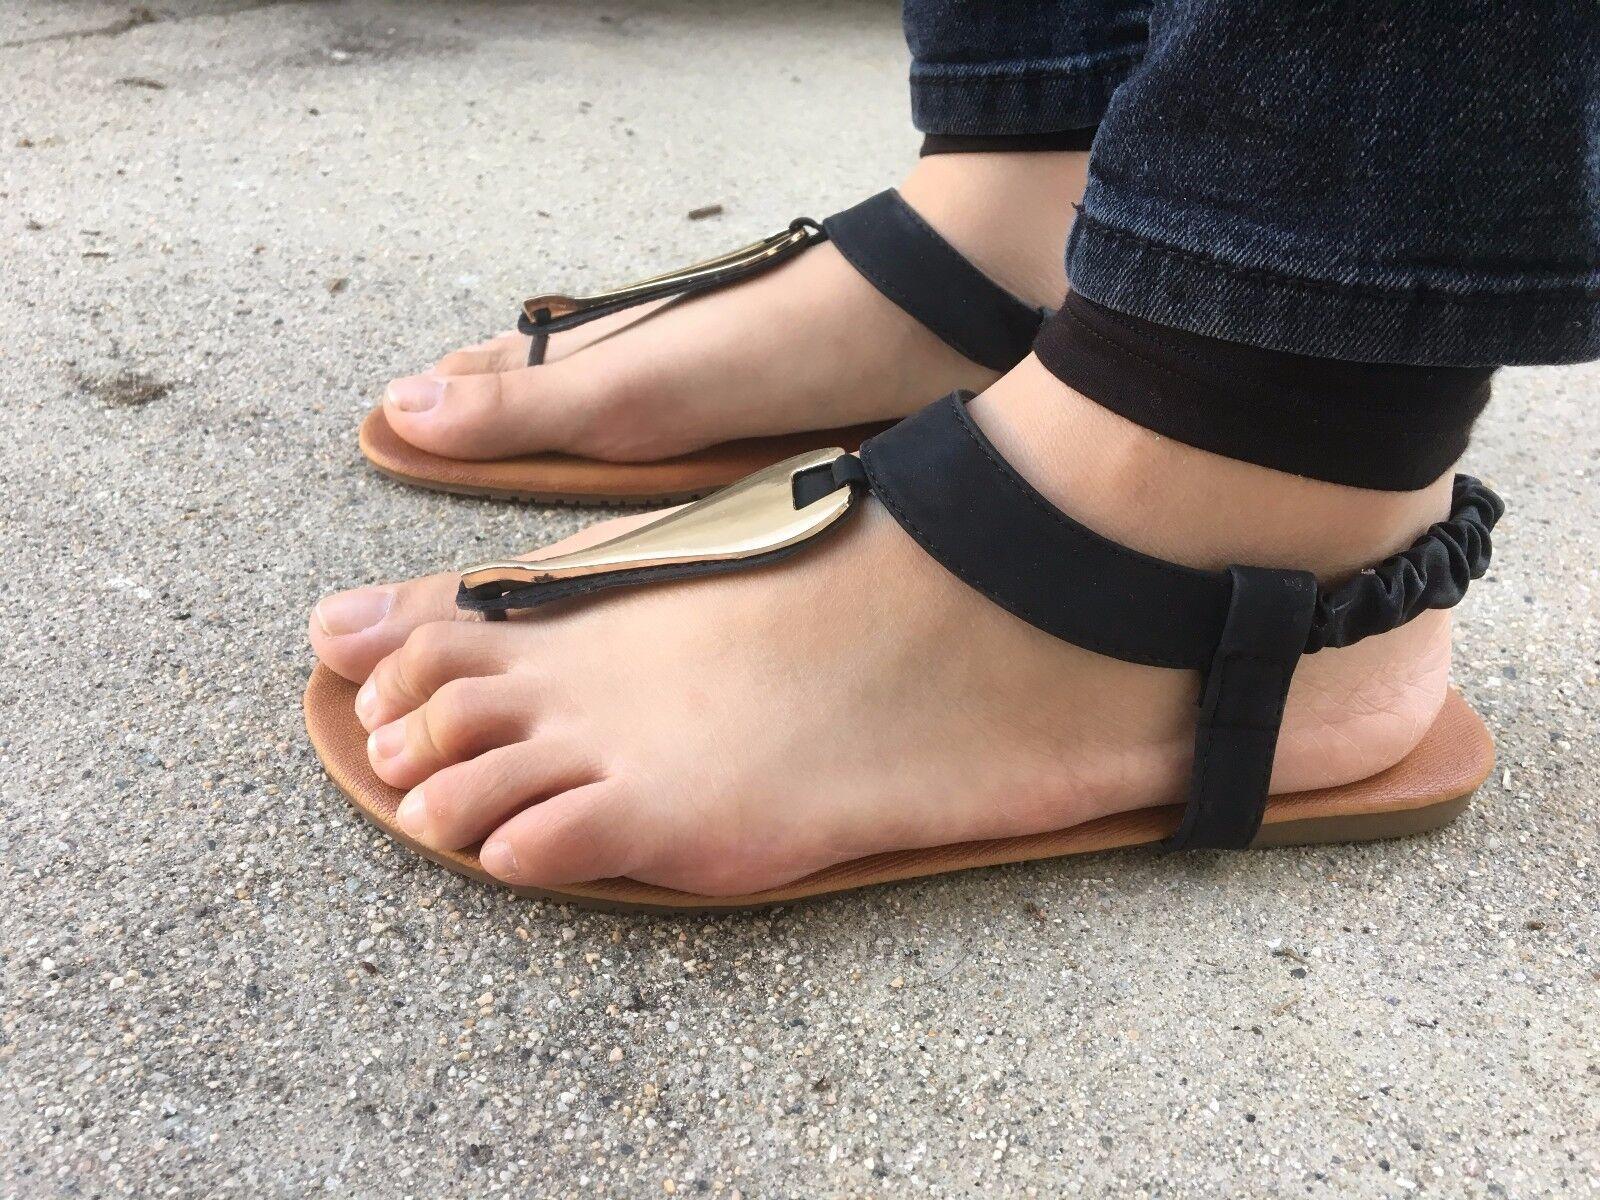 Gladiator Thong Sandals Womens Flop Shoes T Strap Flip Flop Womens Black Sandal NEW Size 7.5 1ffa66